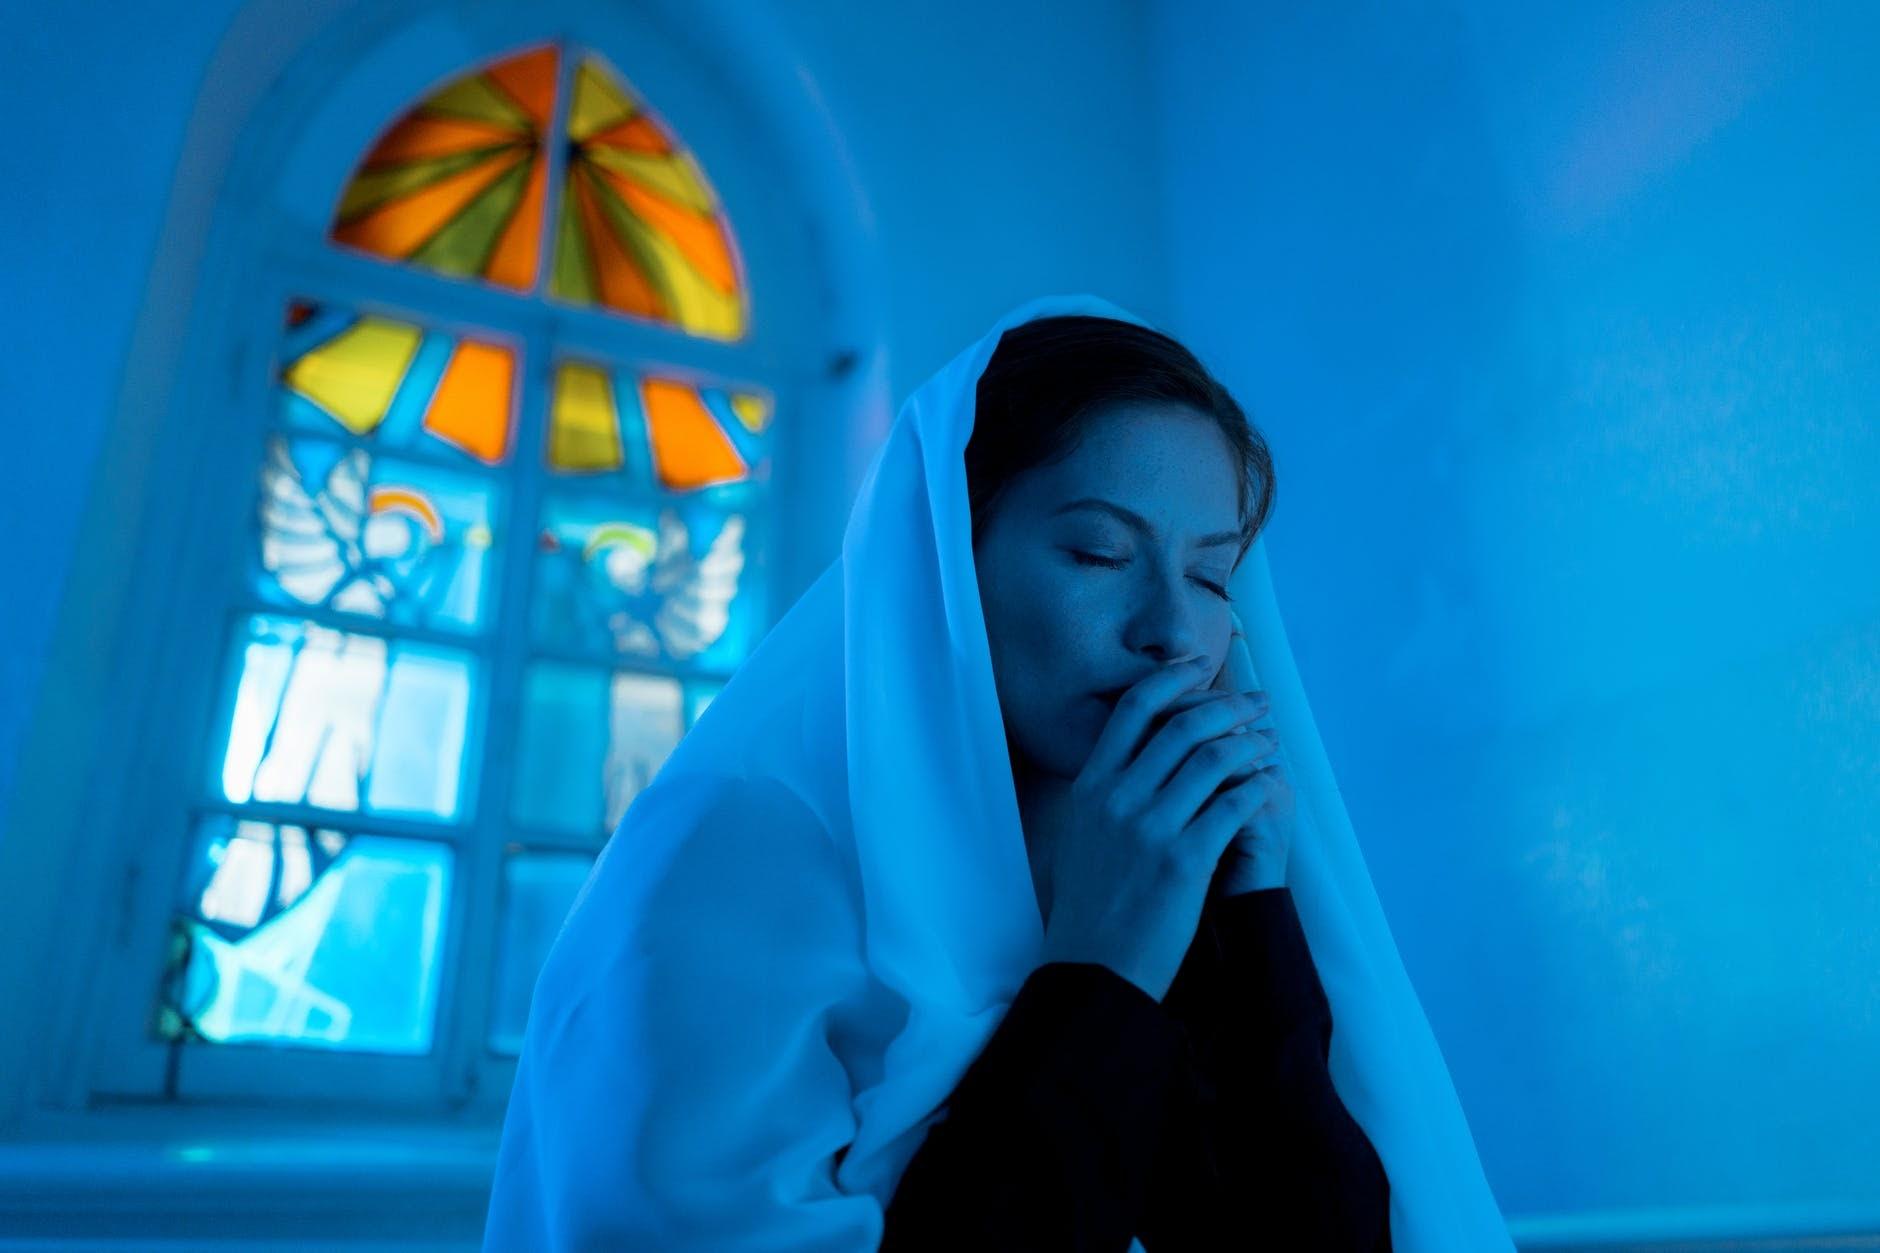 Woman in veil praying in dimly lit church.